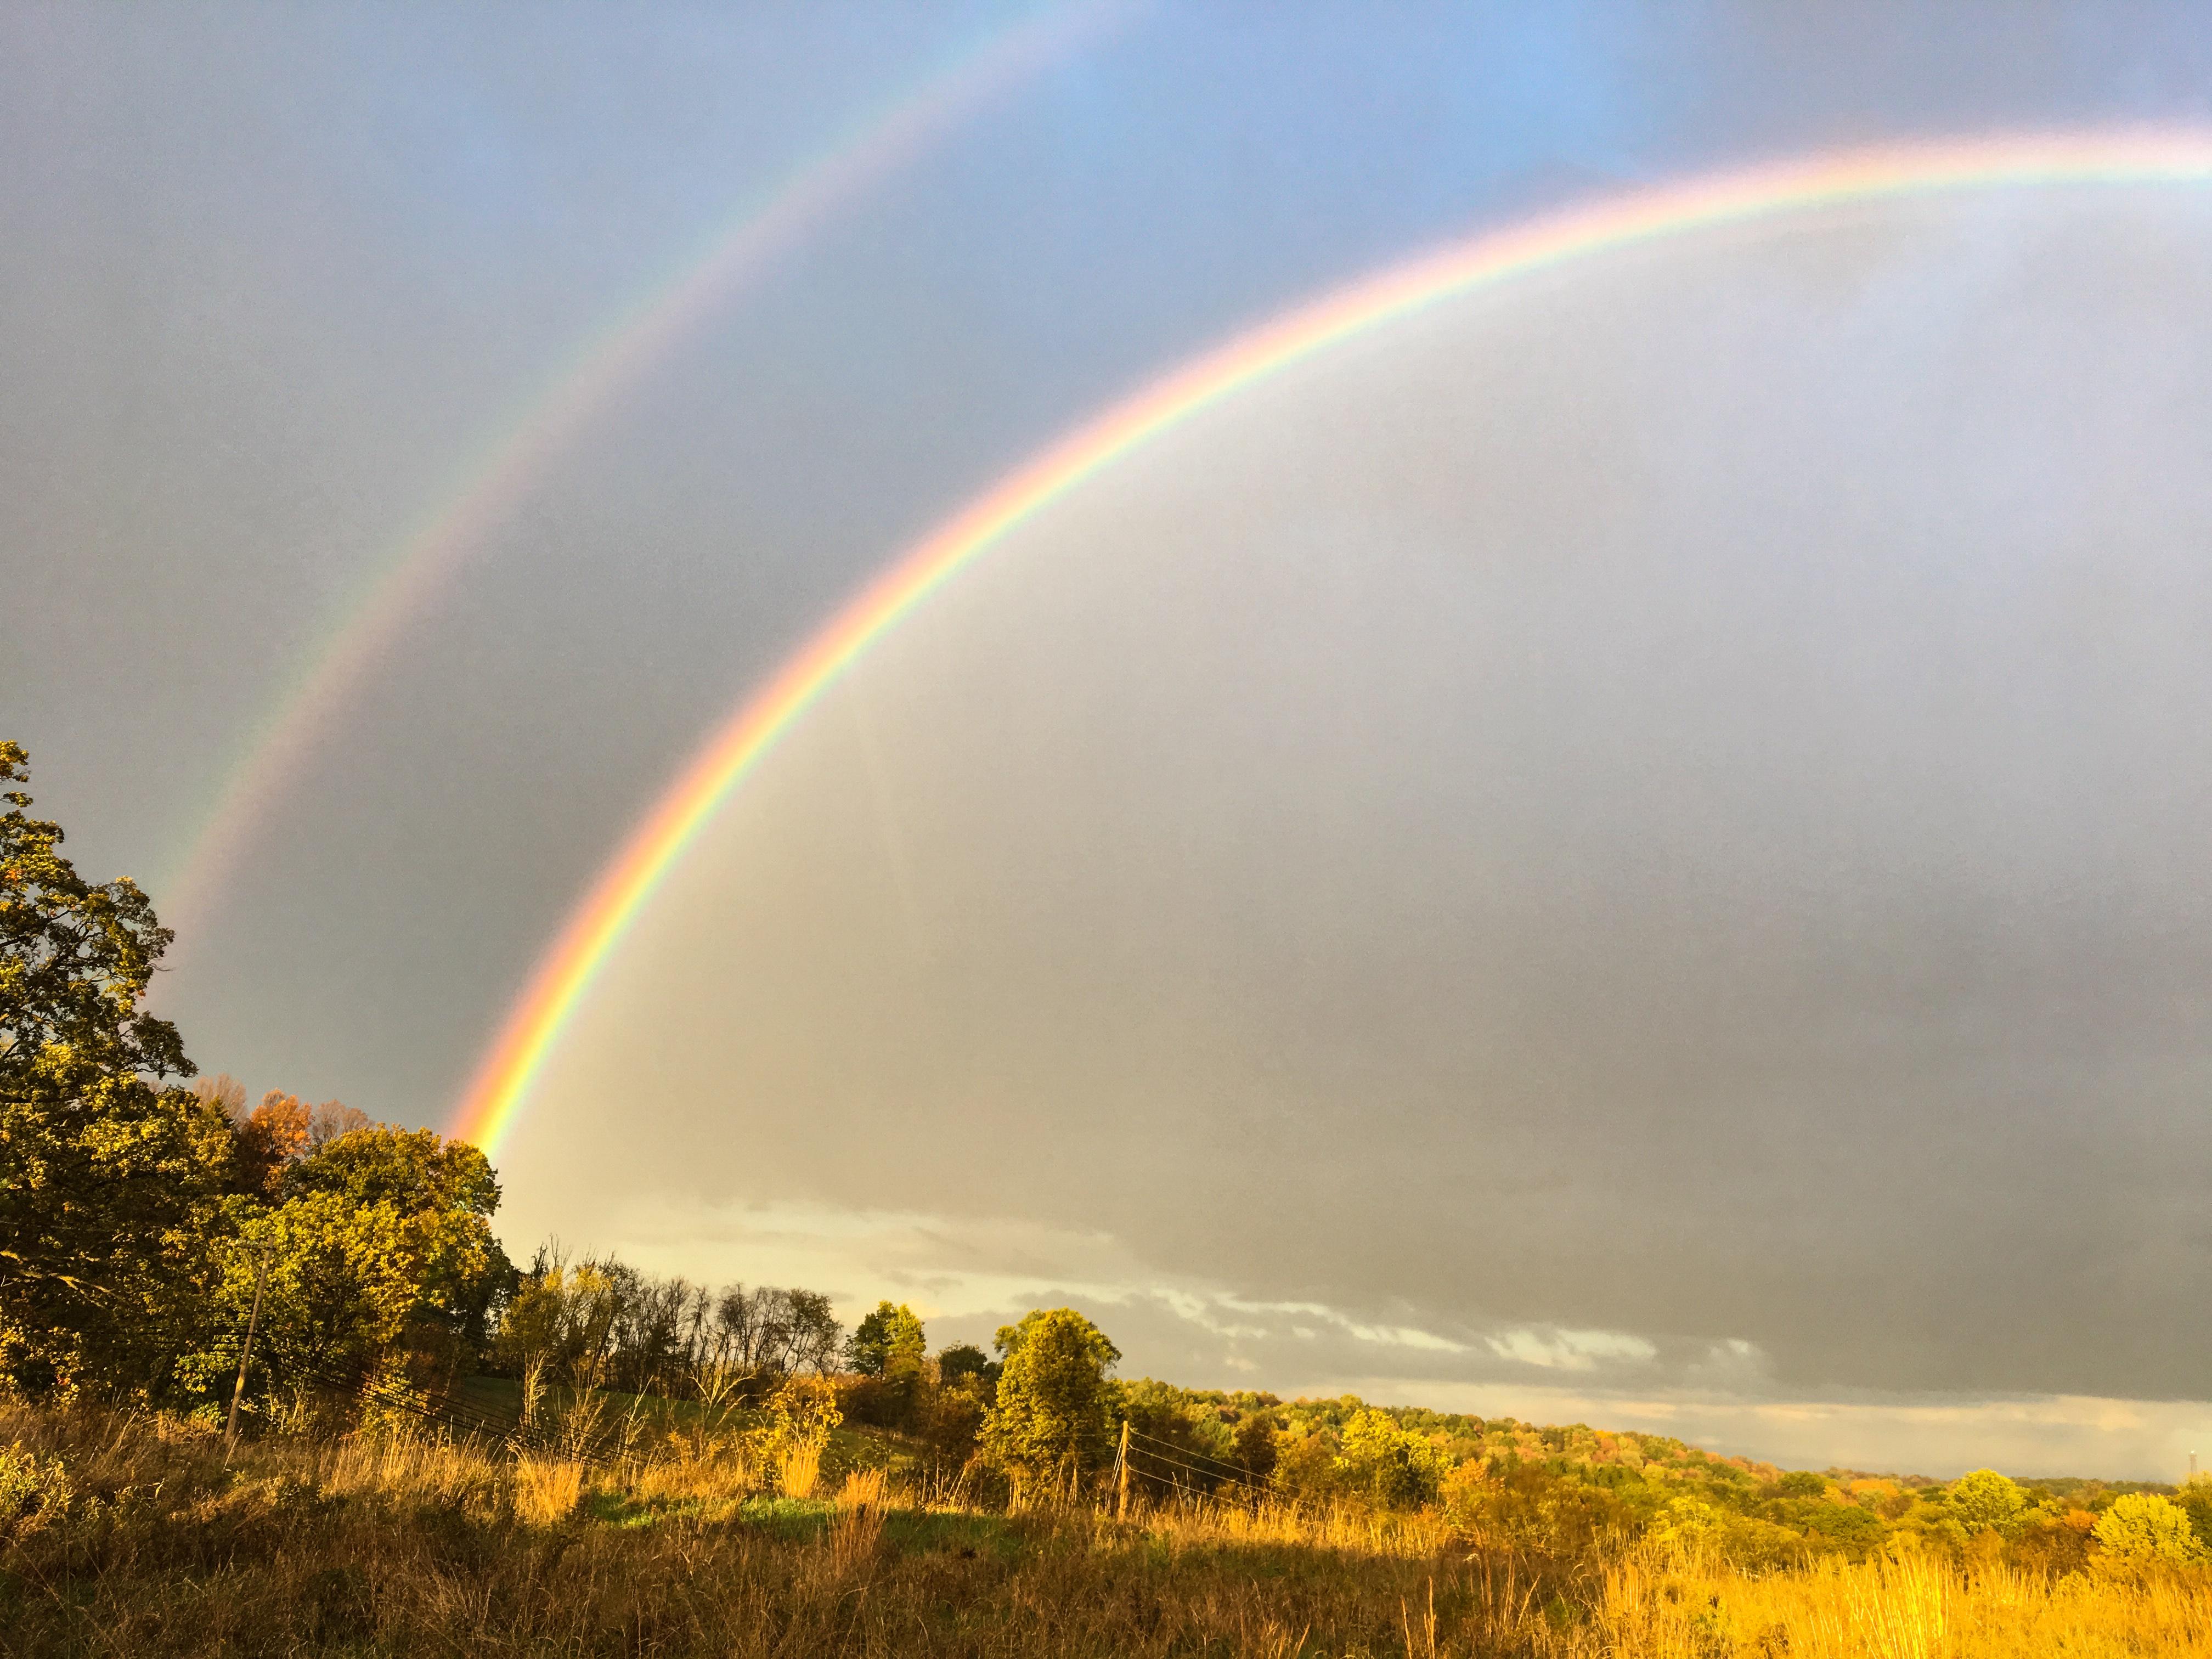 #rainbow, #doublerainbow, #sewickley, #nature, #october, #fall, #rain, #stopthecar